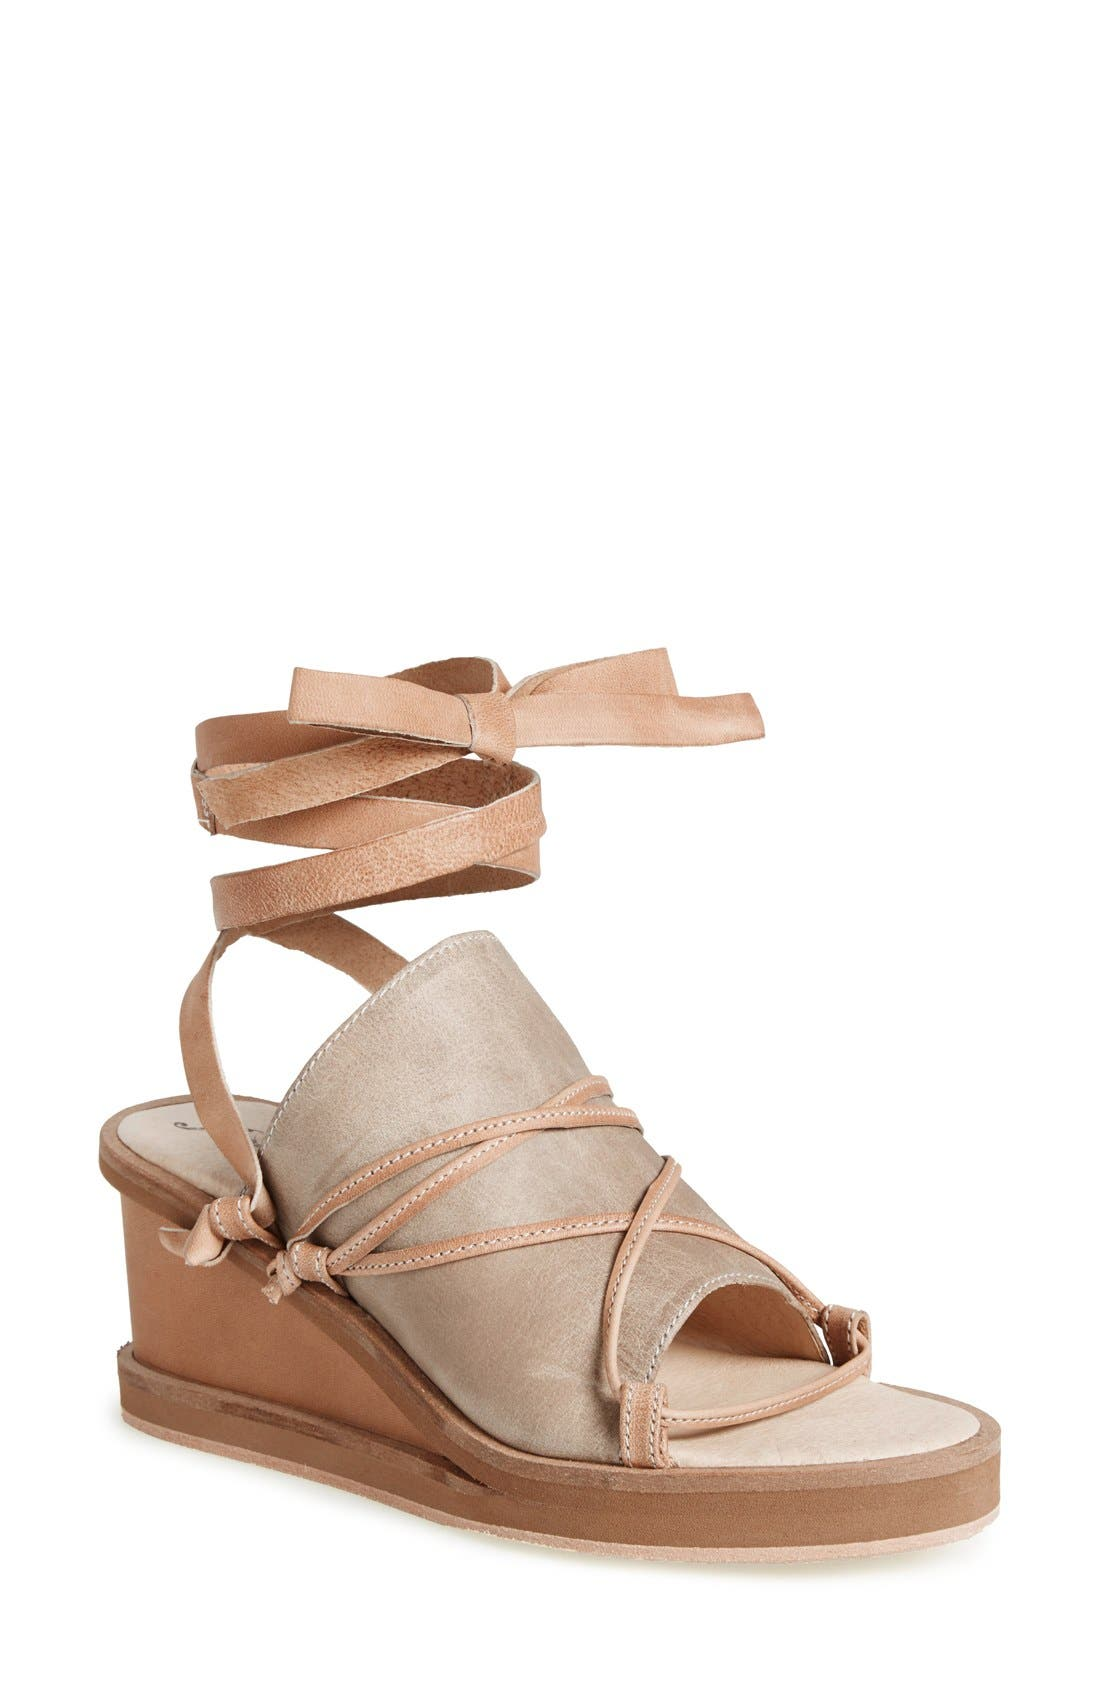 Main Image - Free People 'Bowery' Ankle Tie Wedge Sandal